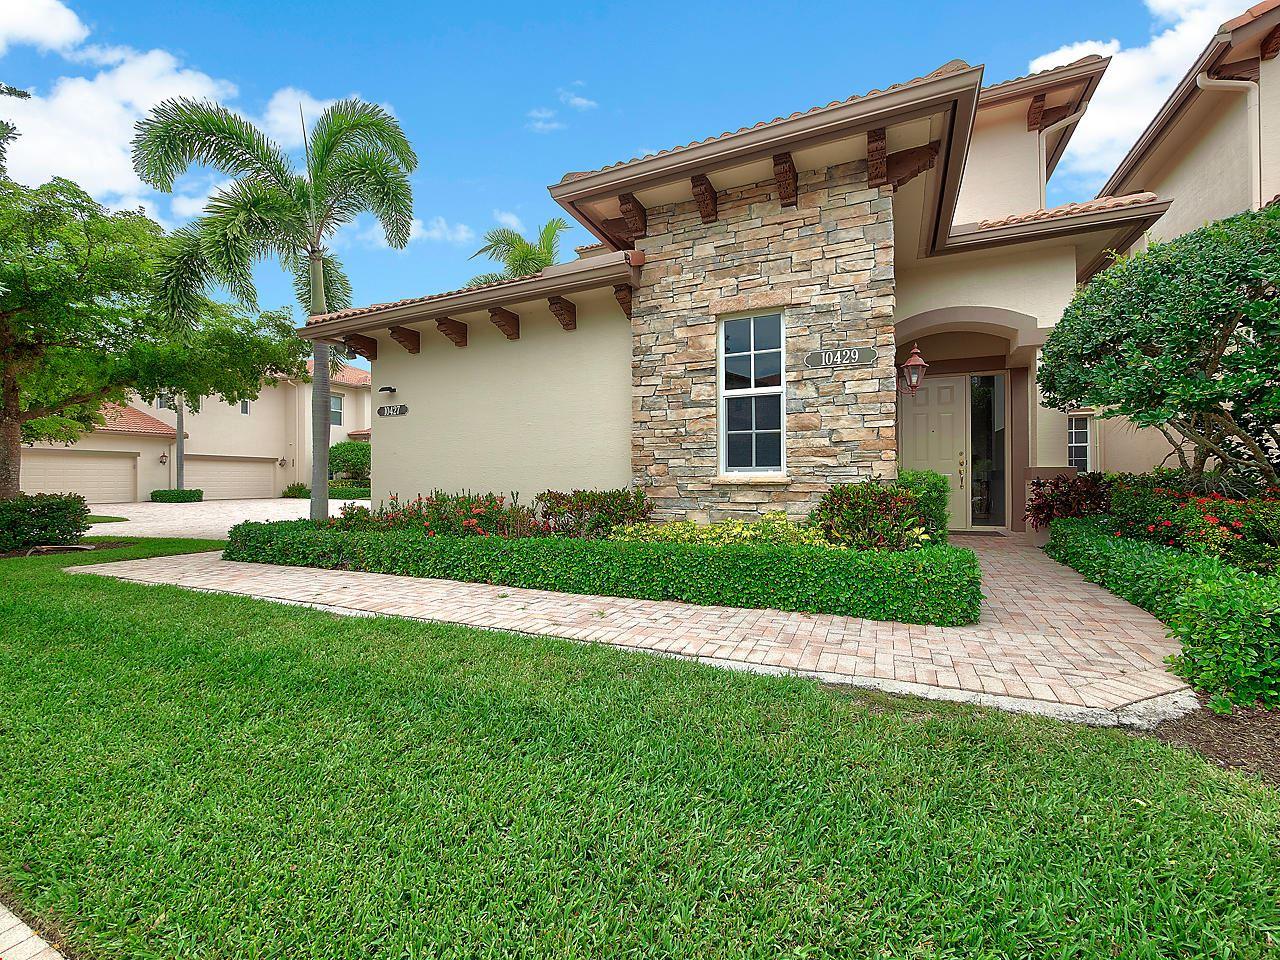 10429 Orchid Reserve Drive, West Palm Beach, FL 33412 - MLS#: RX-10675749